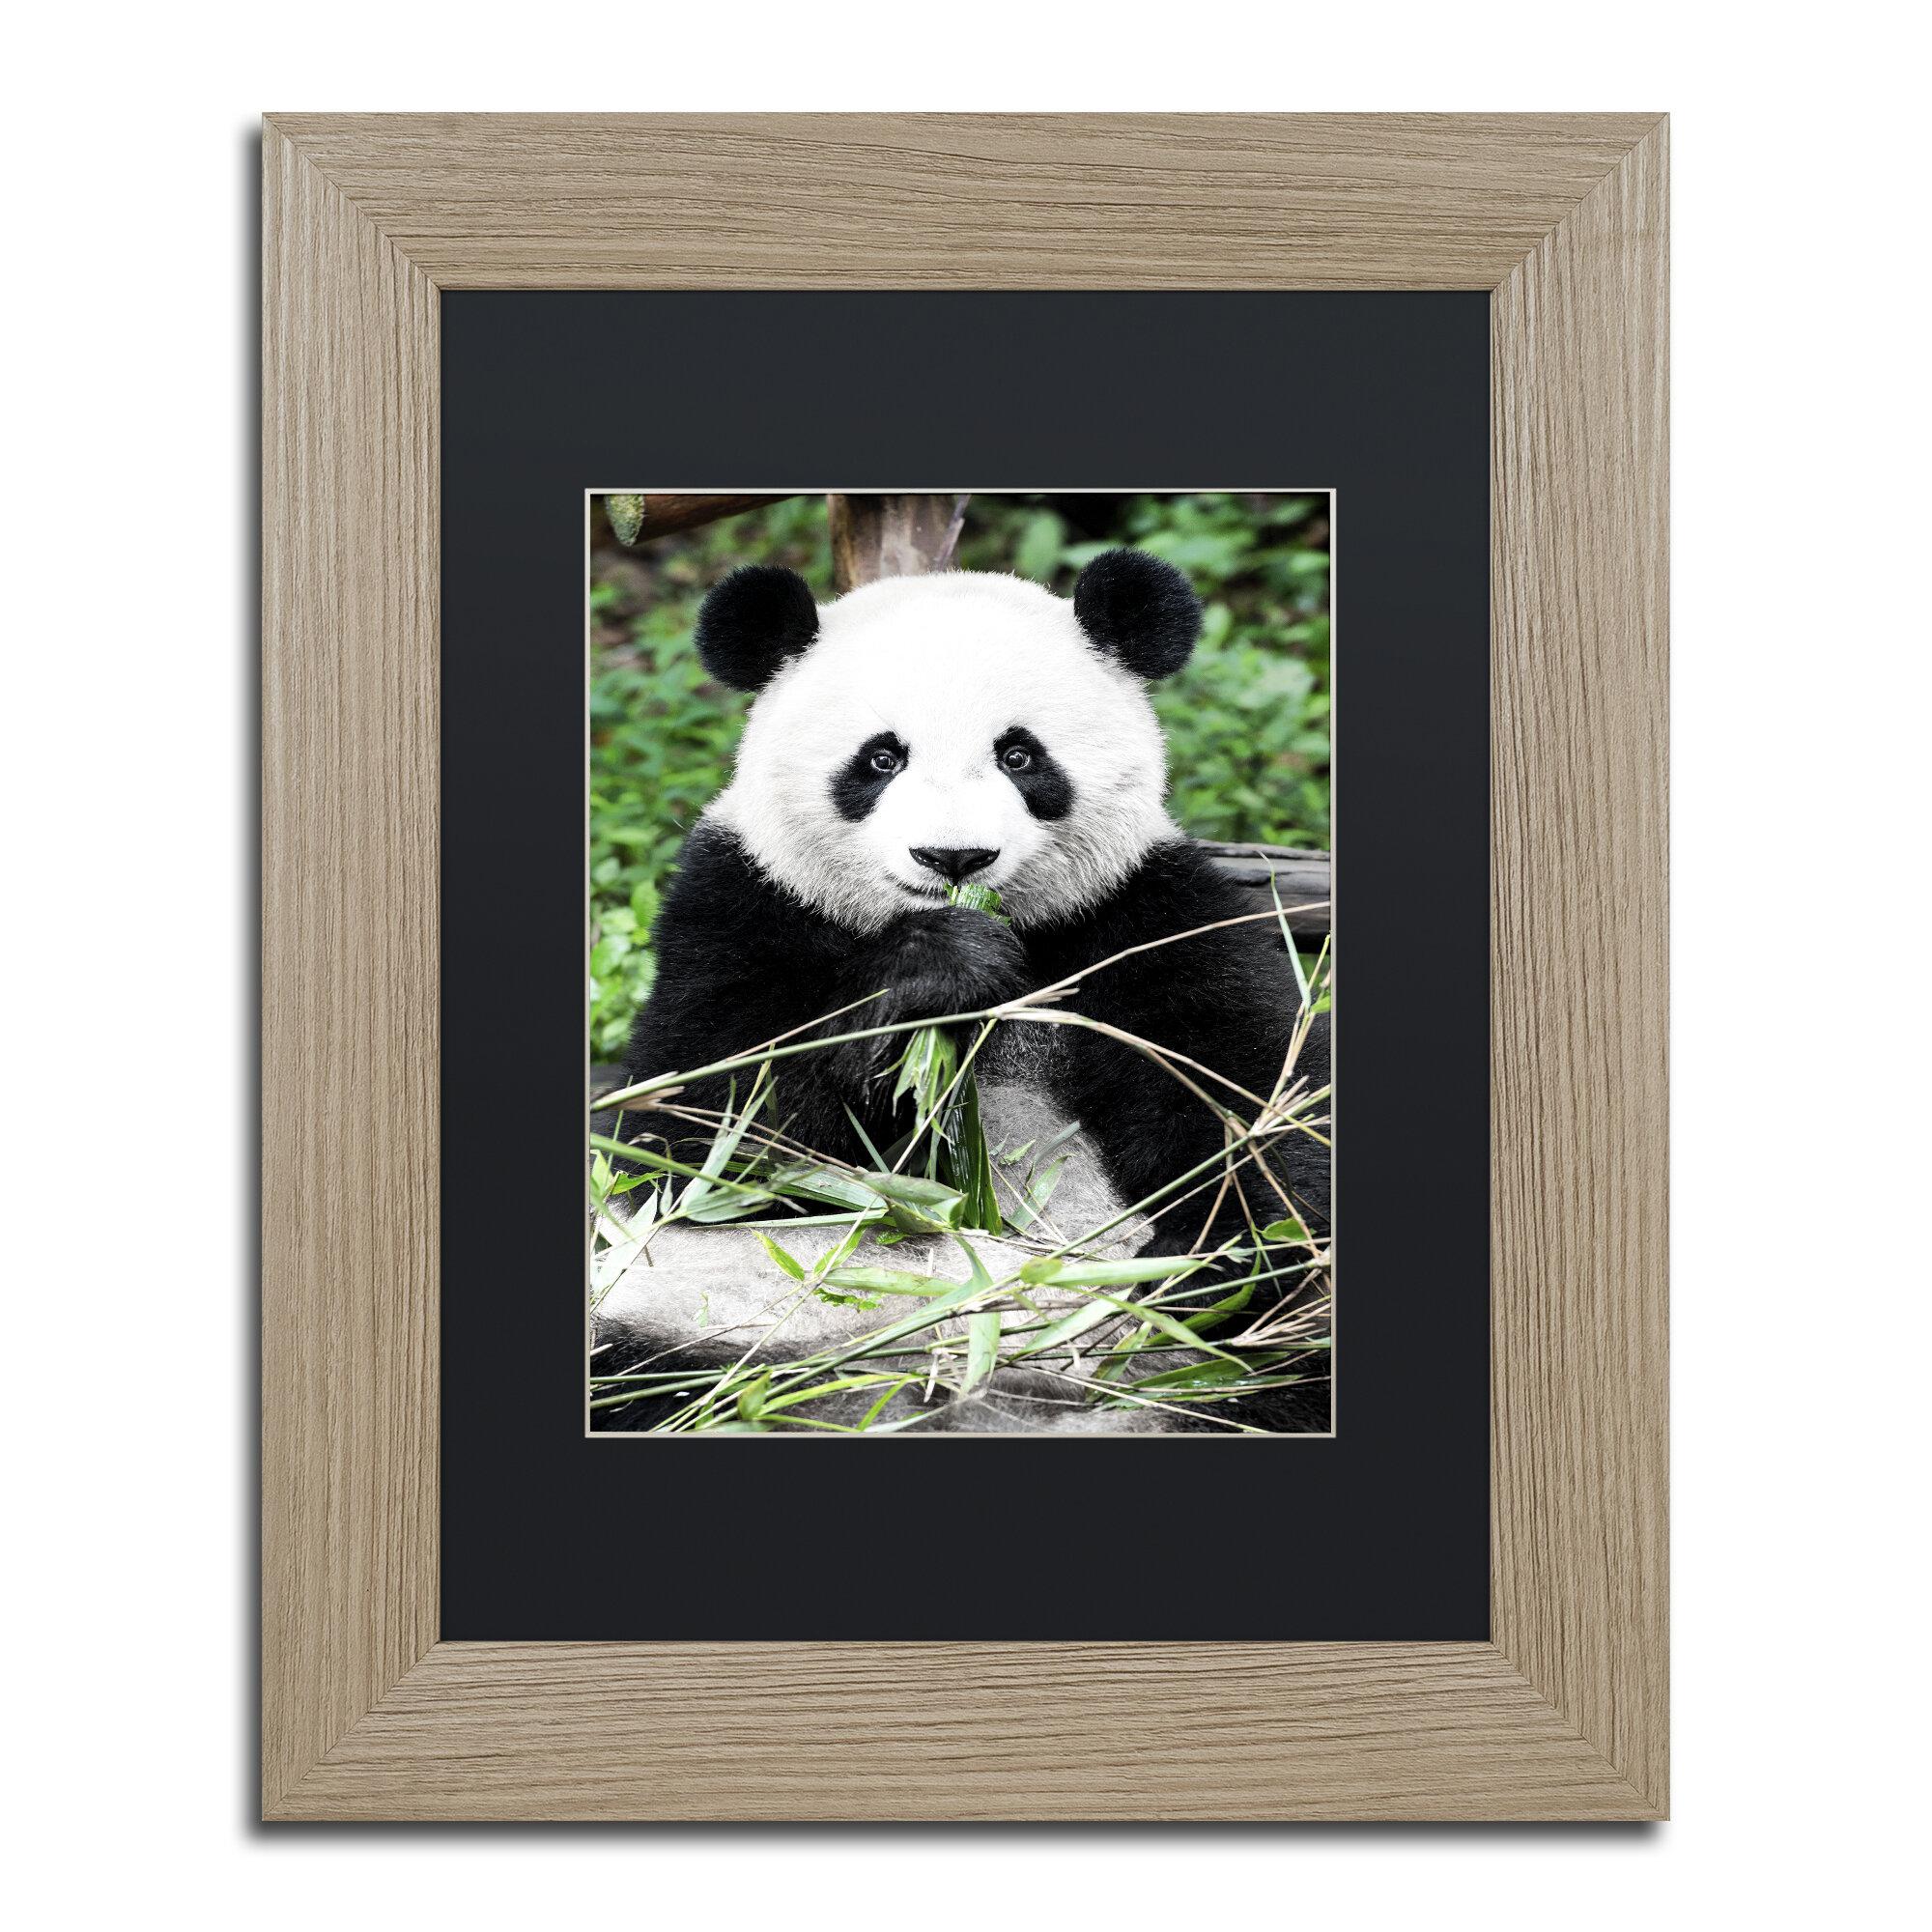 Trademark Art Giant Panda By Philippe Hugonnard Framed Photographic Print Wayfair